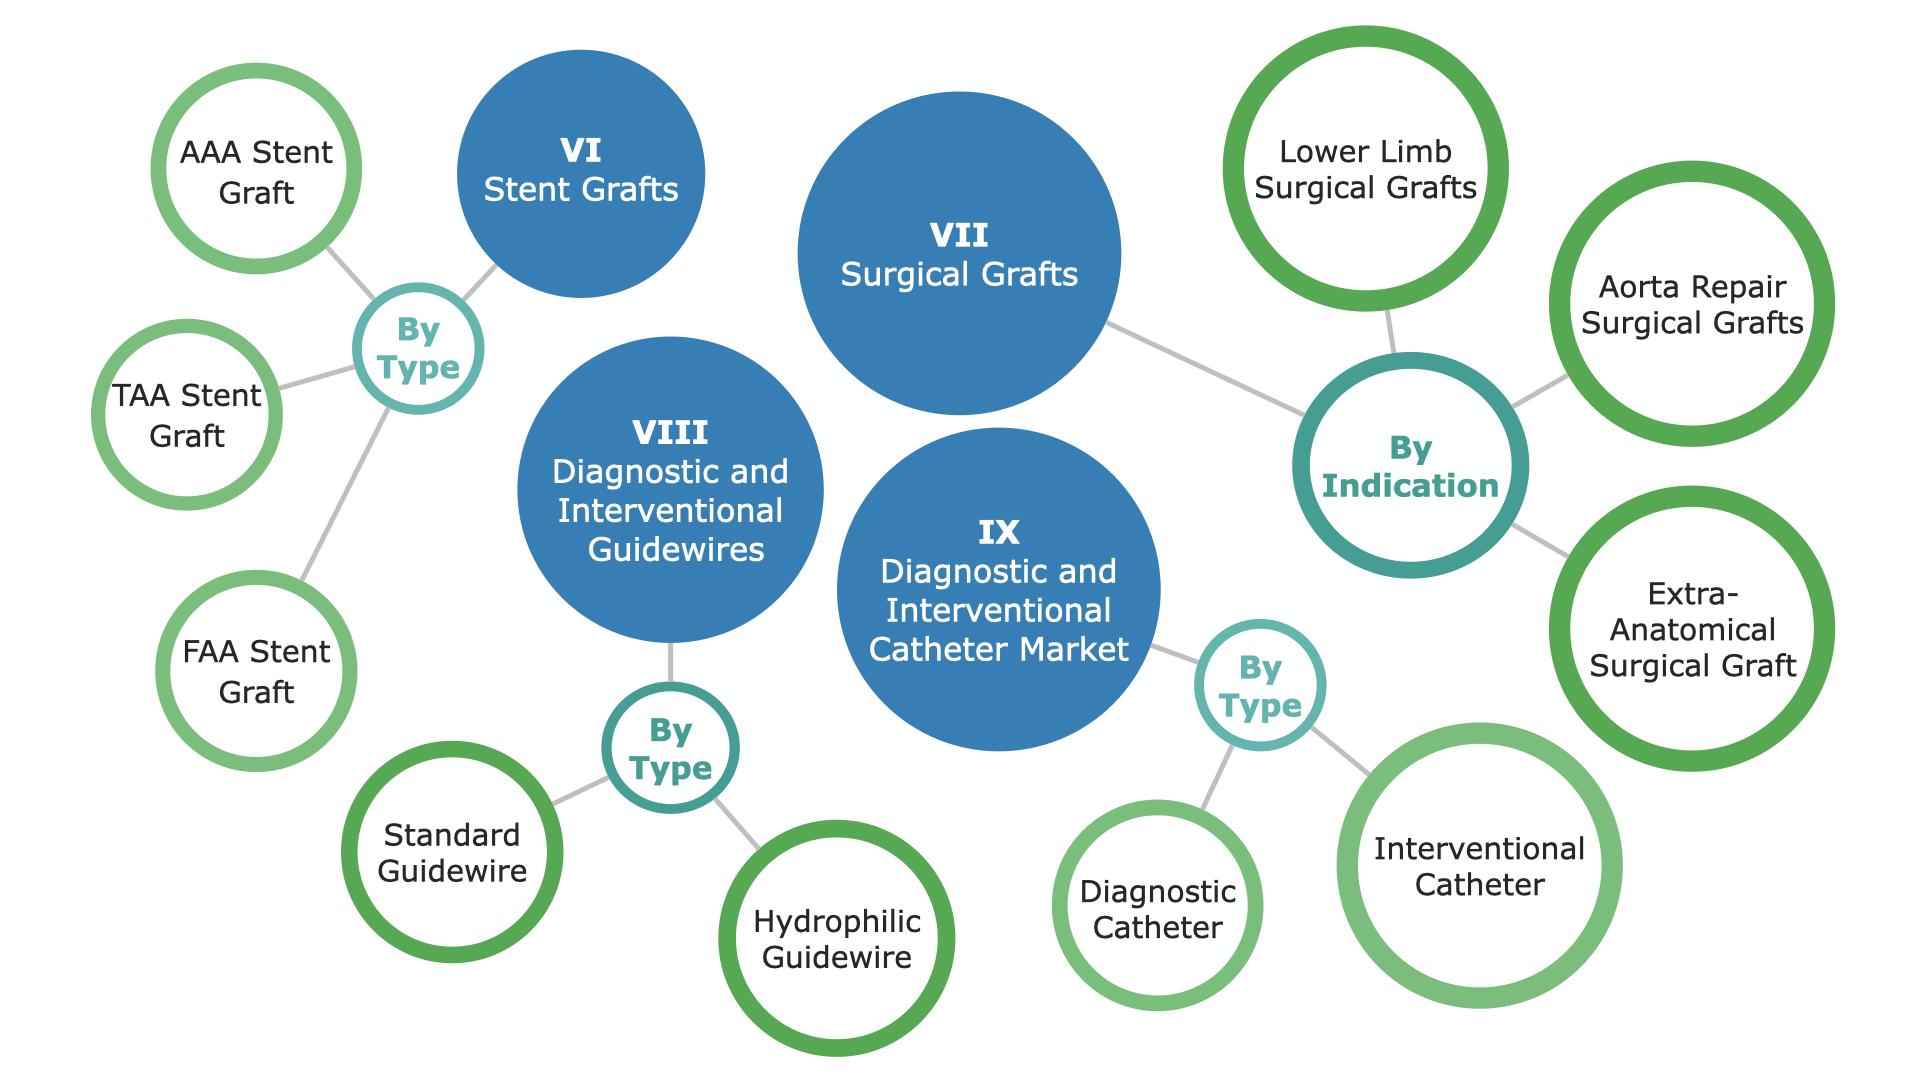 Global Peripheral Vascular Market Segmentation - 2